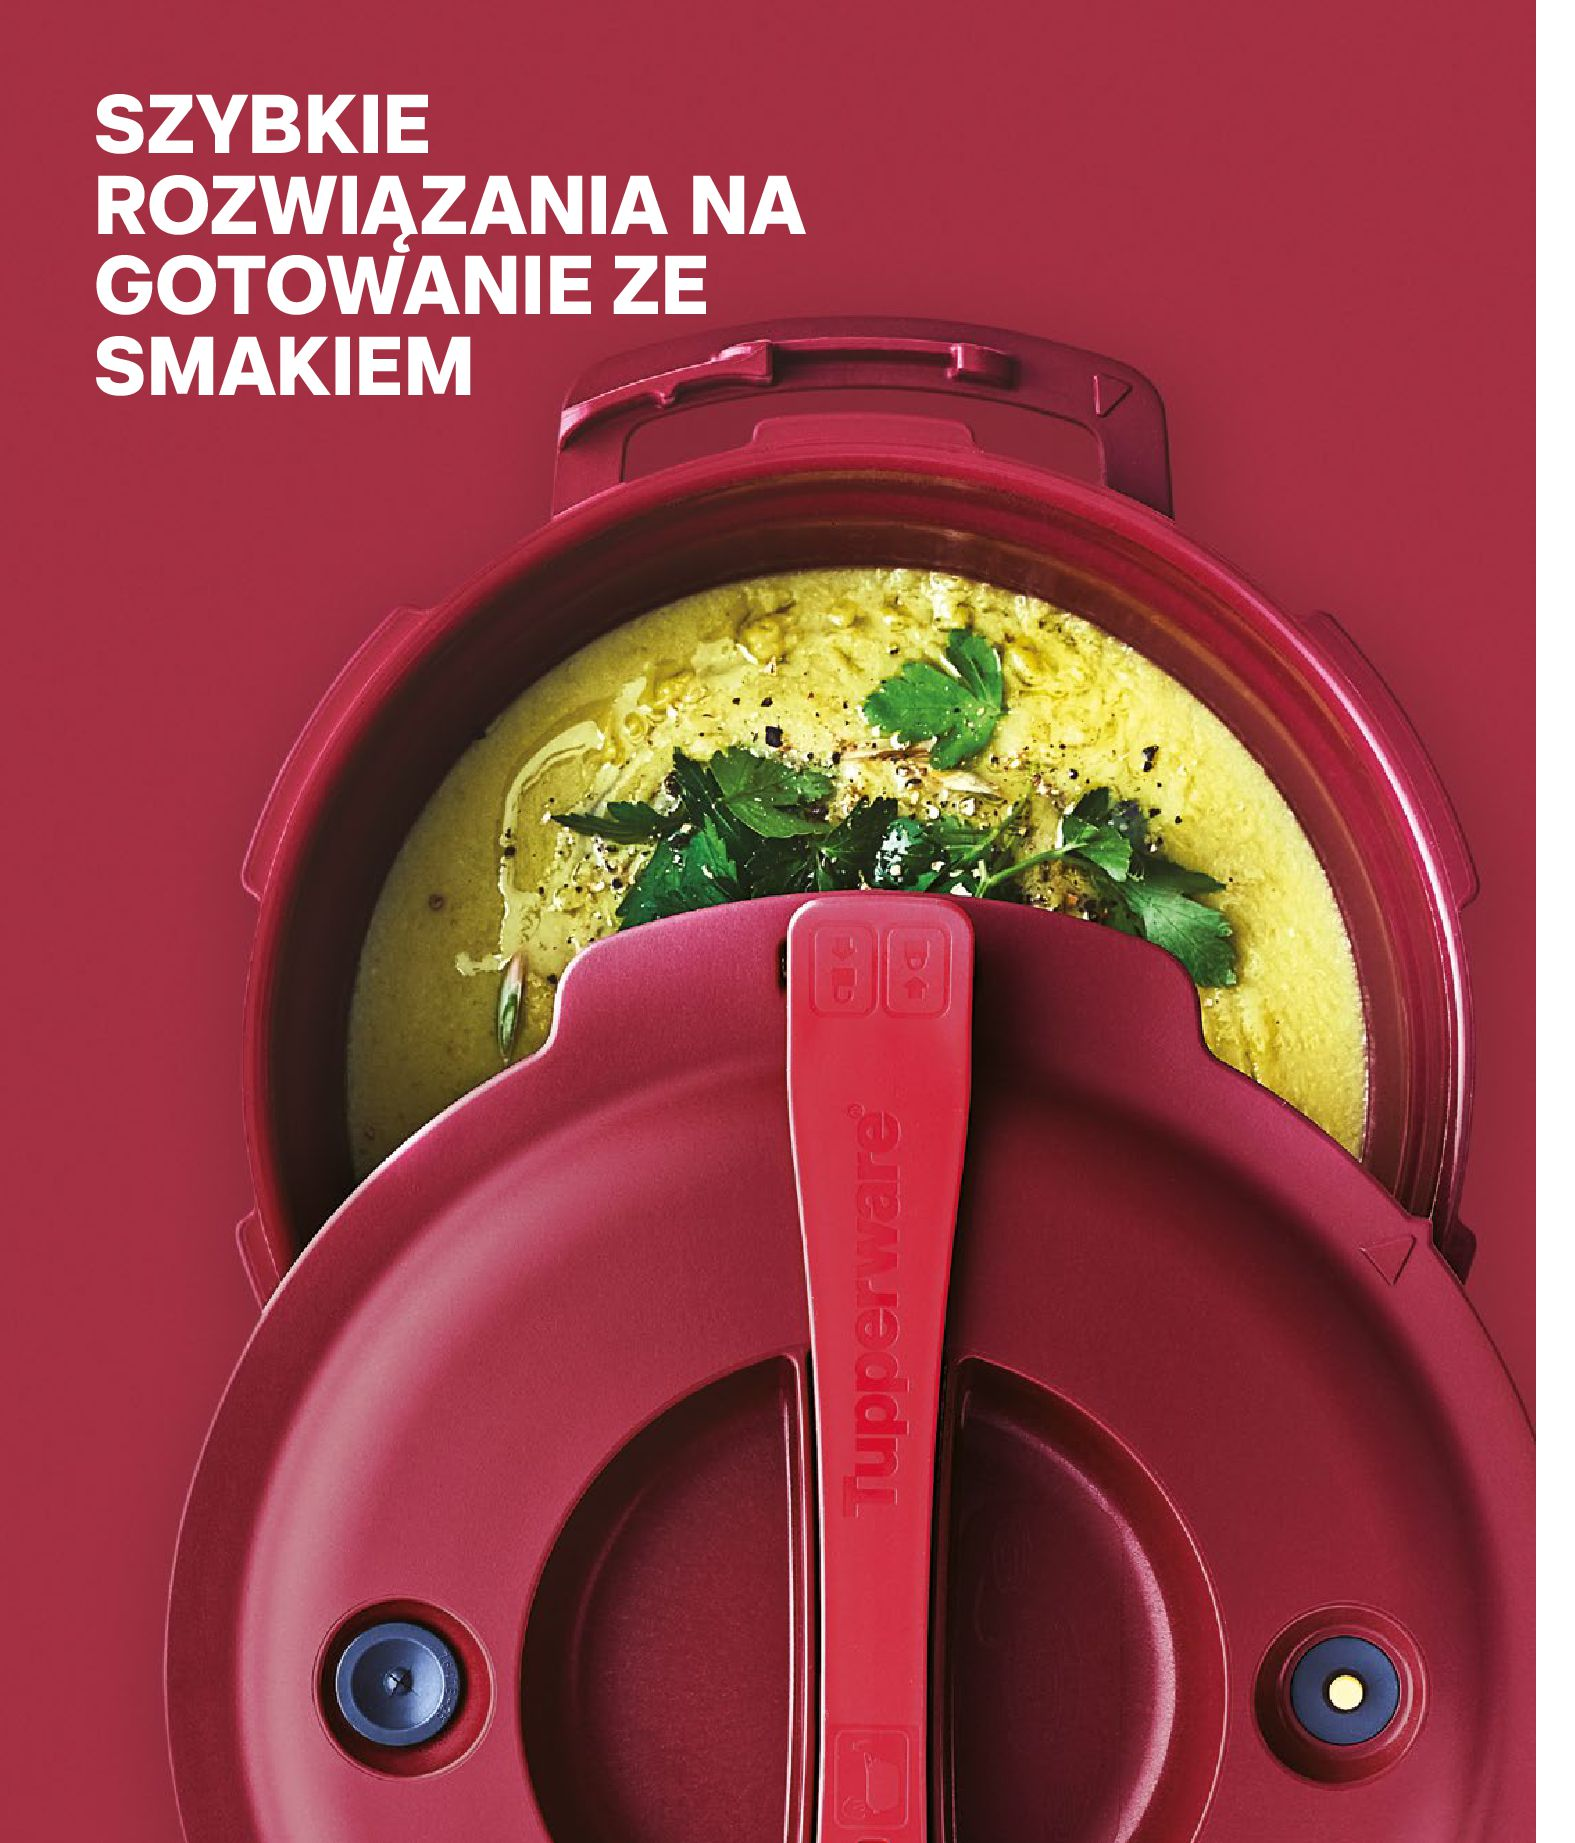 Gazetka Tupperware: Gazetka Tupperware - Katalog wiosna/ lato 2021-05-10 page-48